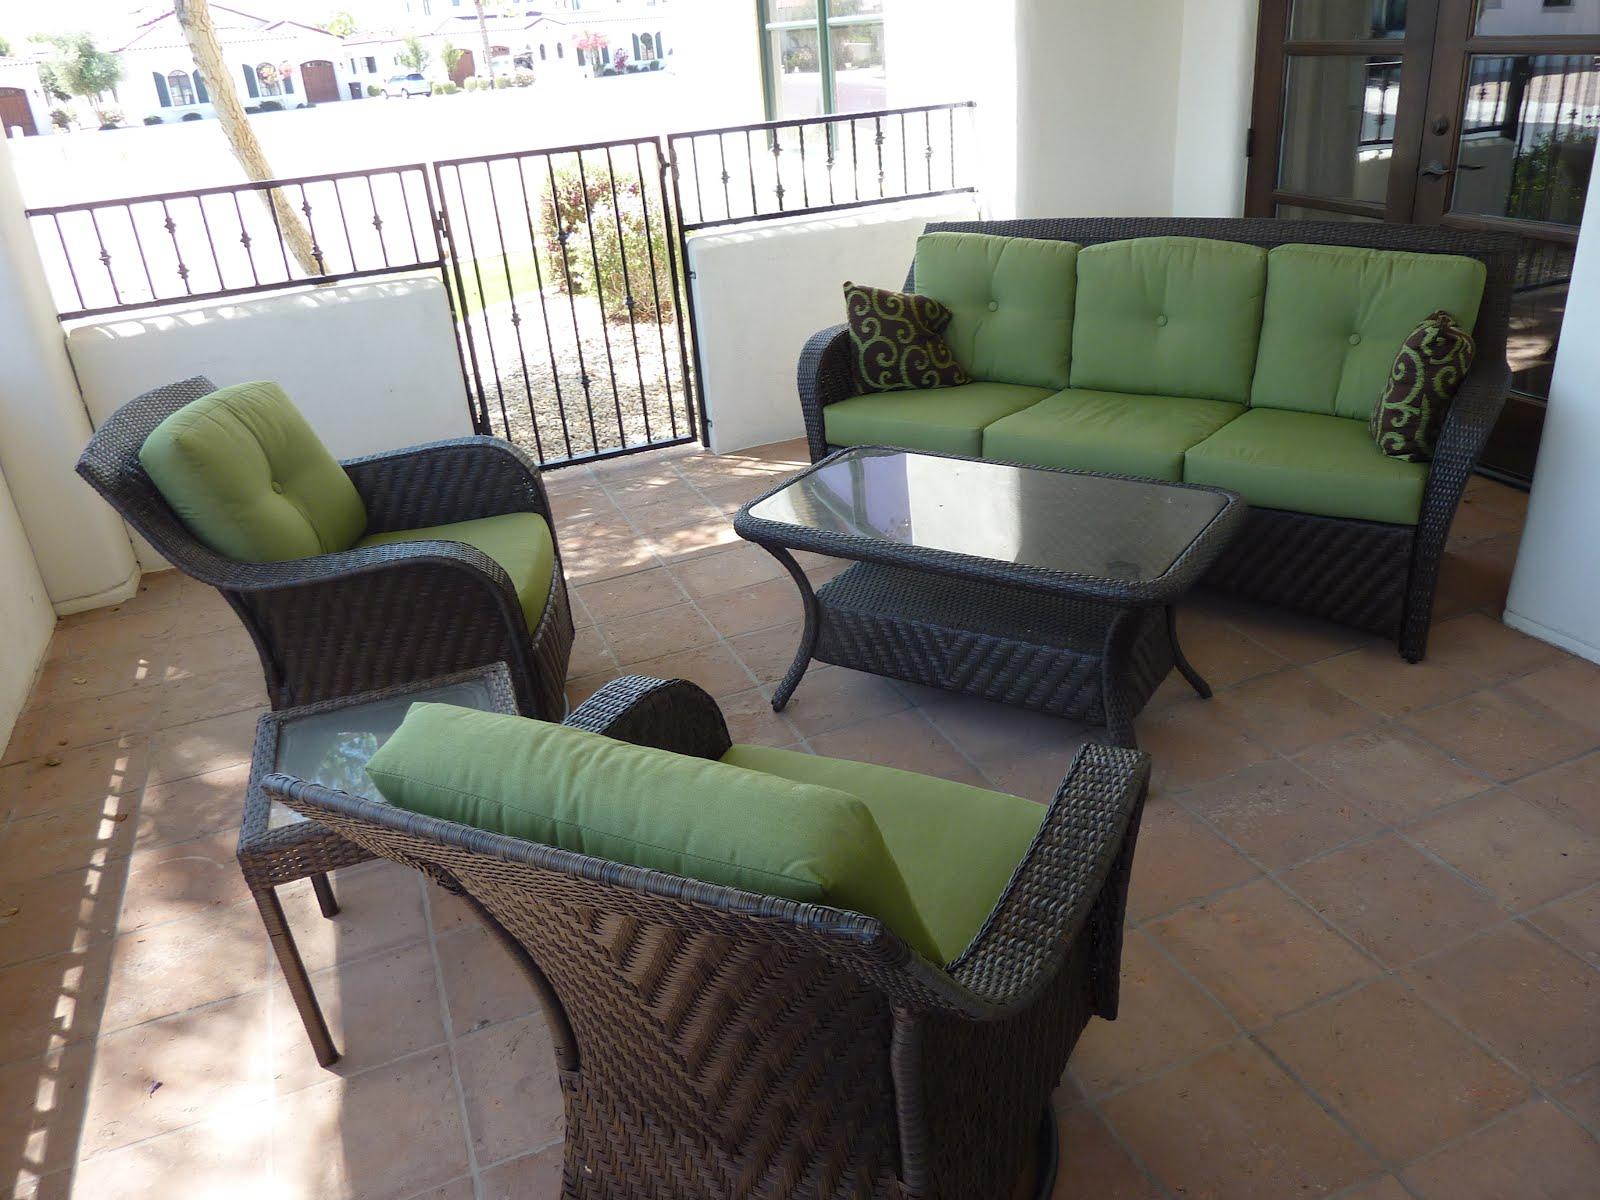 sam s club lawn chairs folding chair job lot patio ideas design great nice